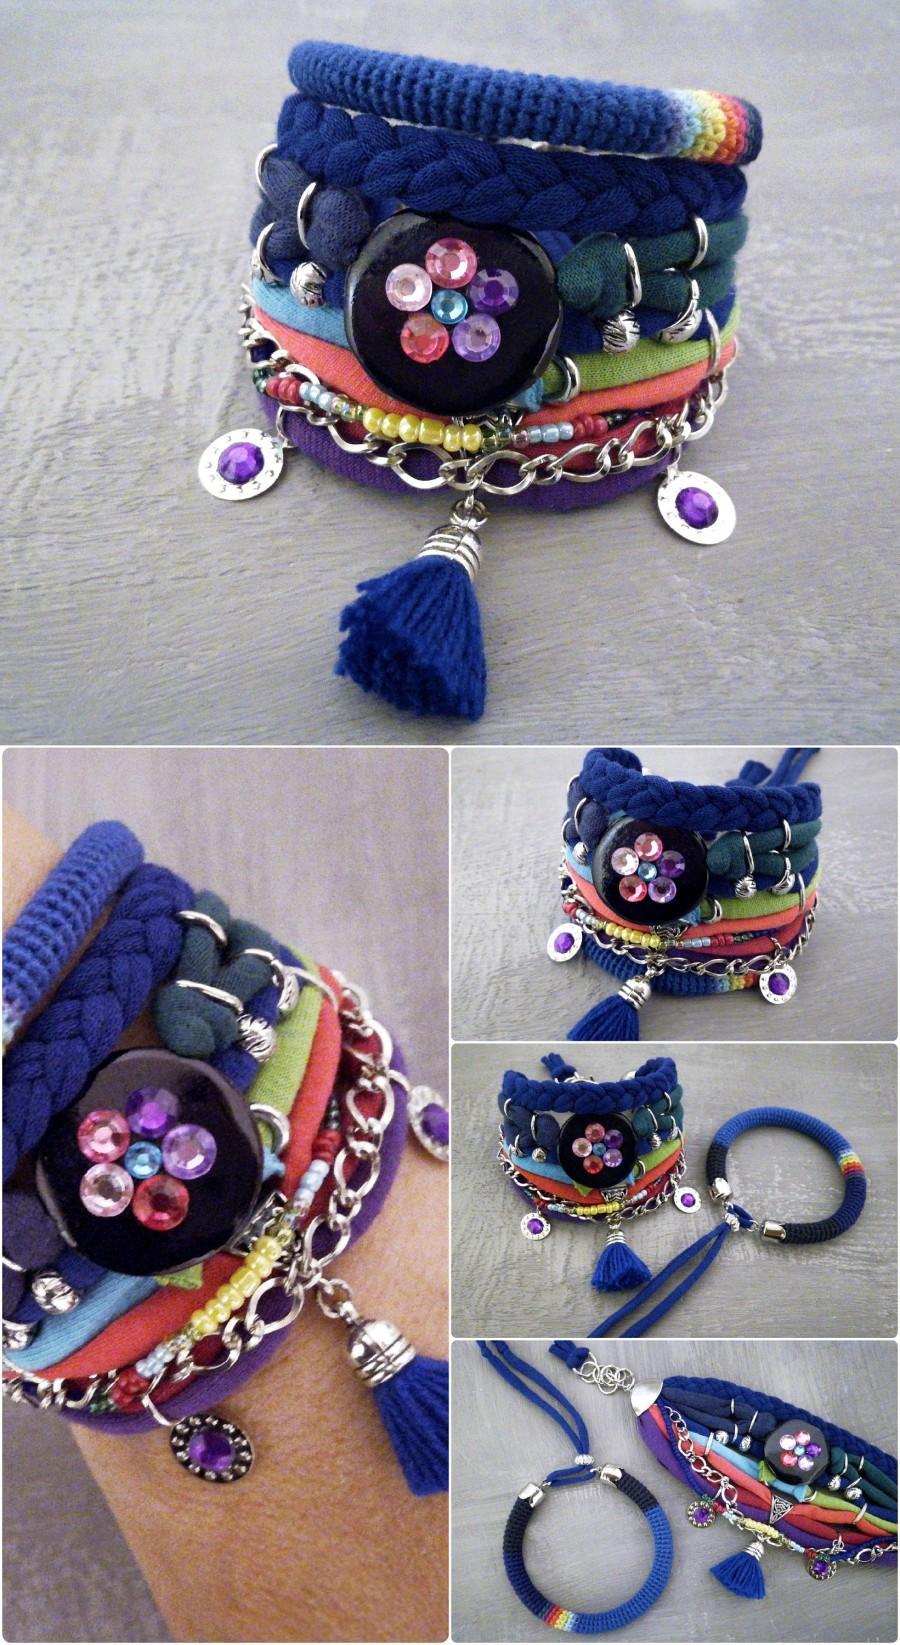 Hochzeit - Bohemian Bracelet Aurora Borealis, Bohemian Jewelry Jersey Bracelet, Crochet Bracelet, Galaxy Boho Bracelet Set Northern Lights